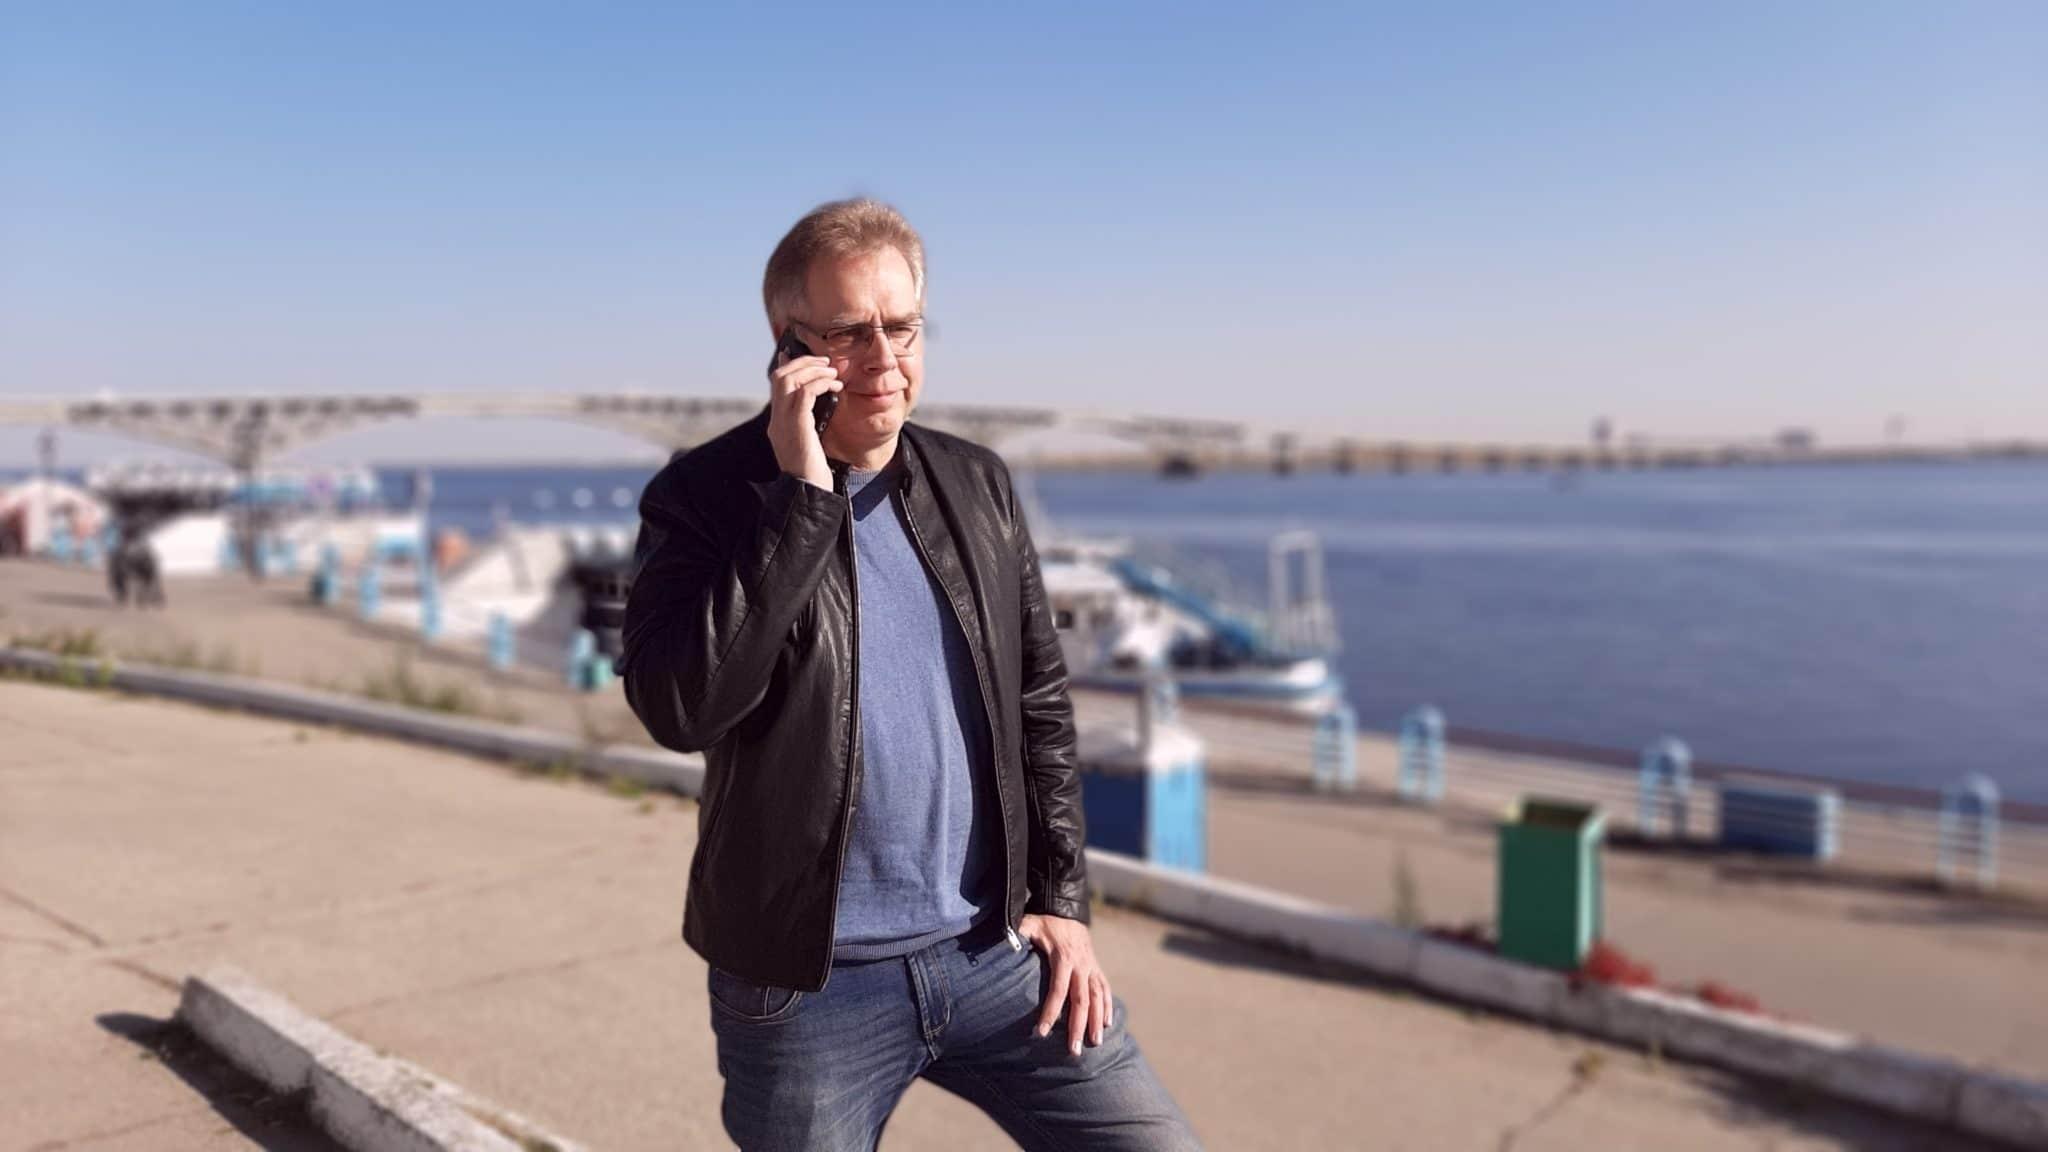 Matthew Dykstra Digital Nomad 2020